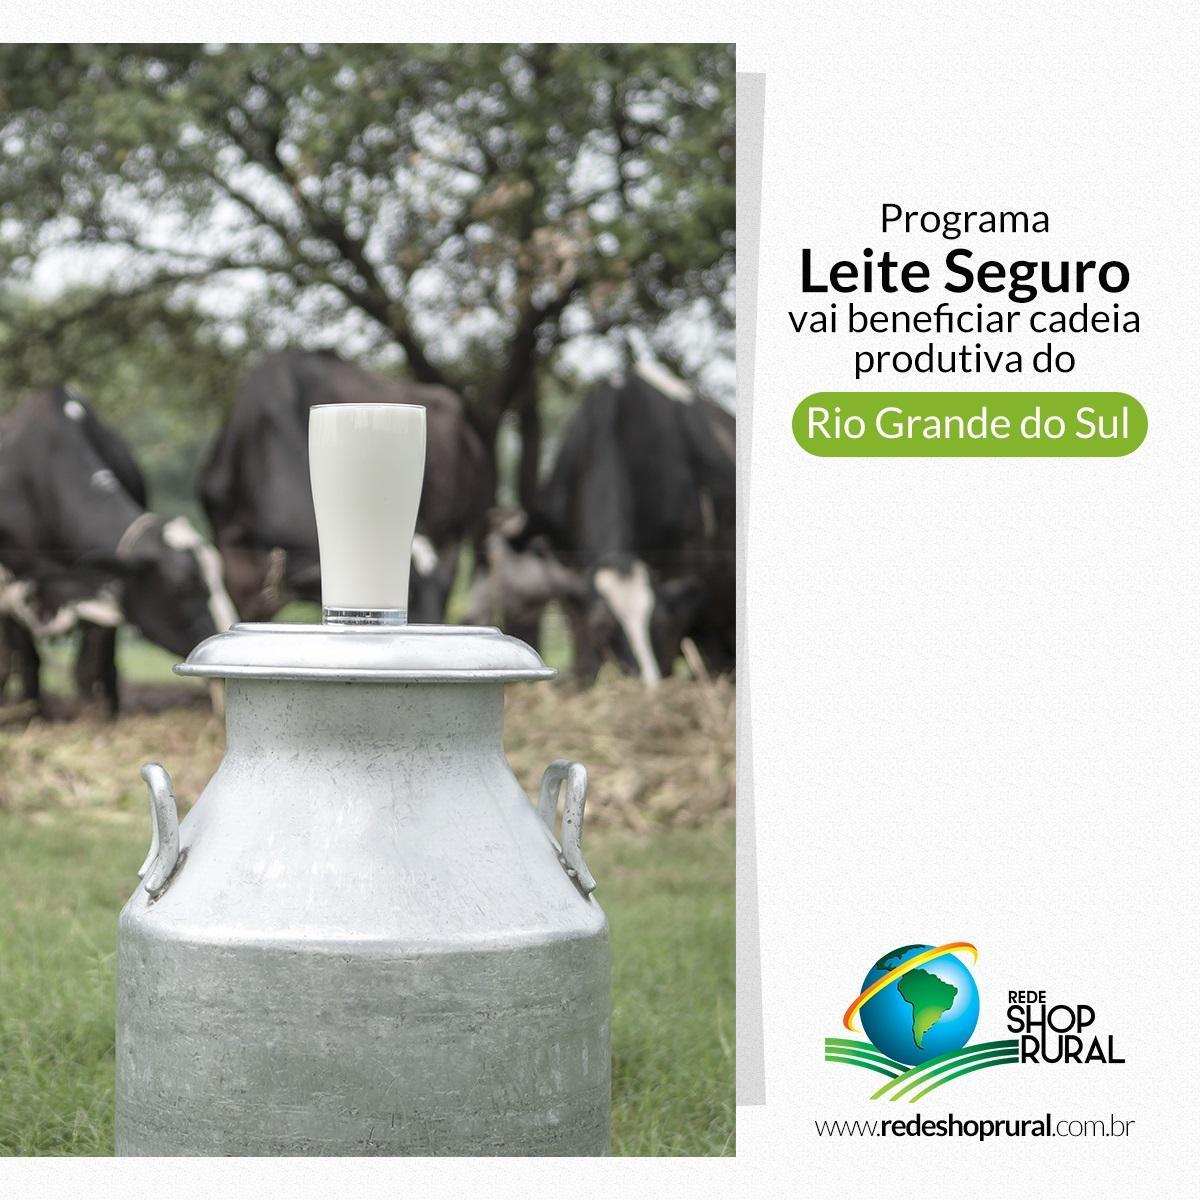 Programa Leite Seguro vai beneficiar cadeia produtiva do Rio Grande do Sul